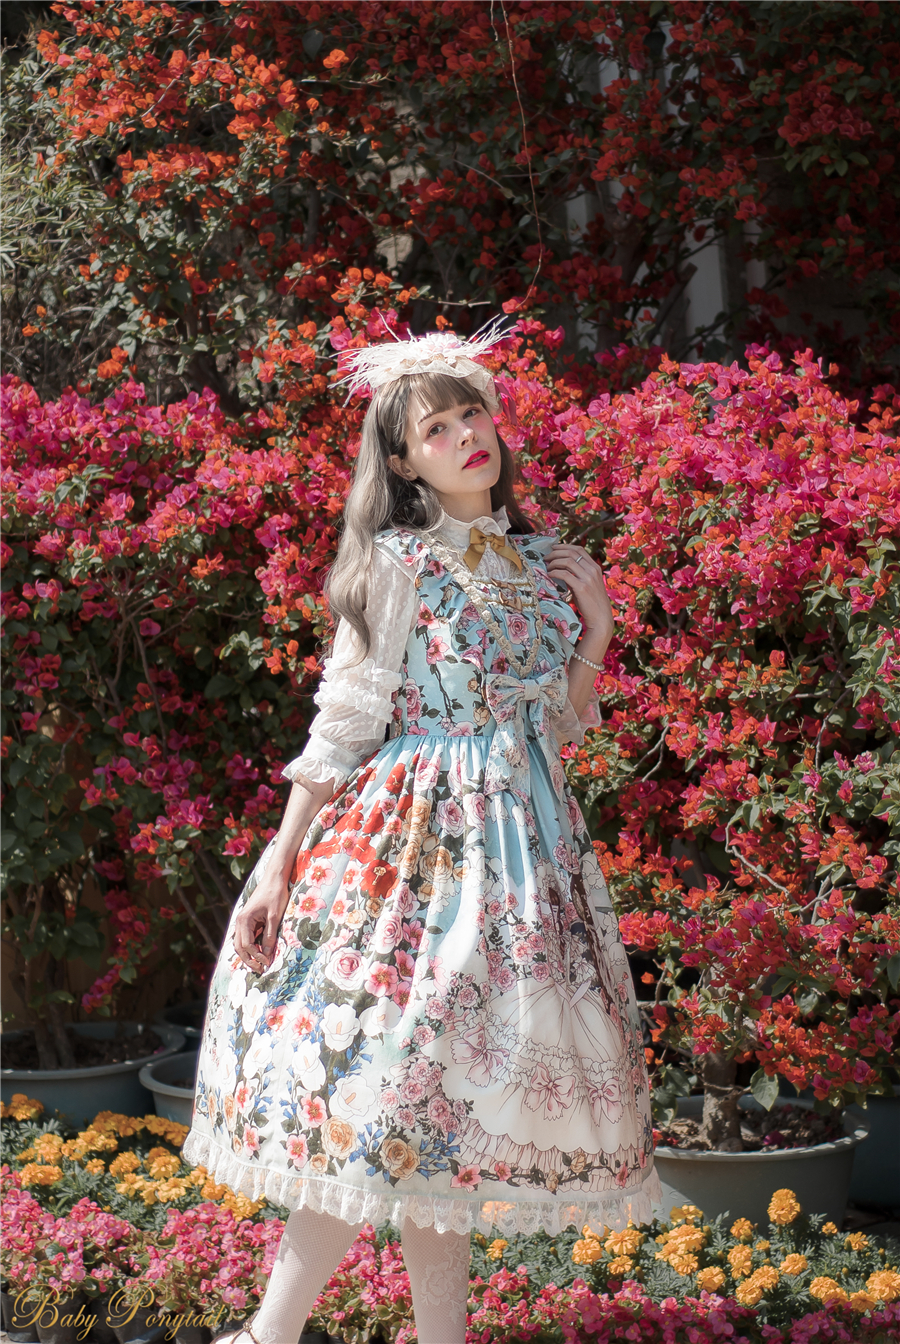 Baby Ponytail_Model Photo_Polly's Garden of Dreams_JSK Sky_Claudia01.jpg